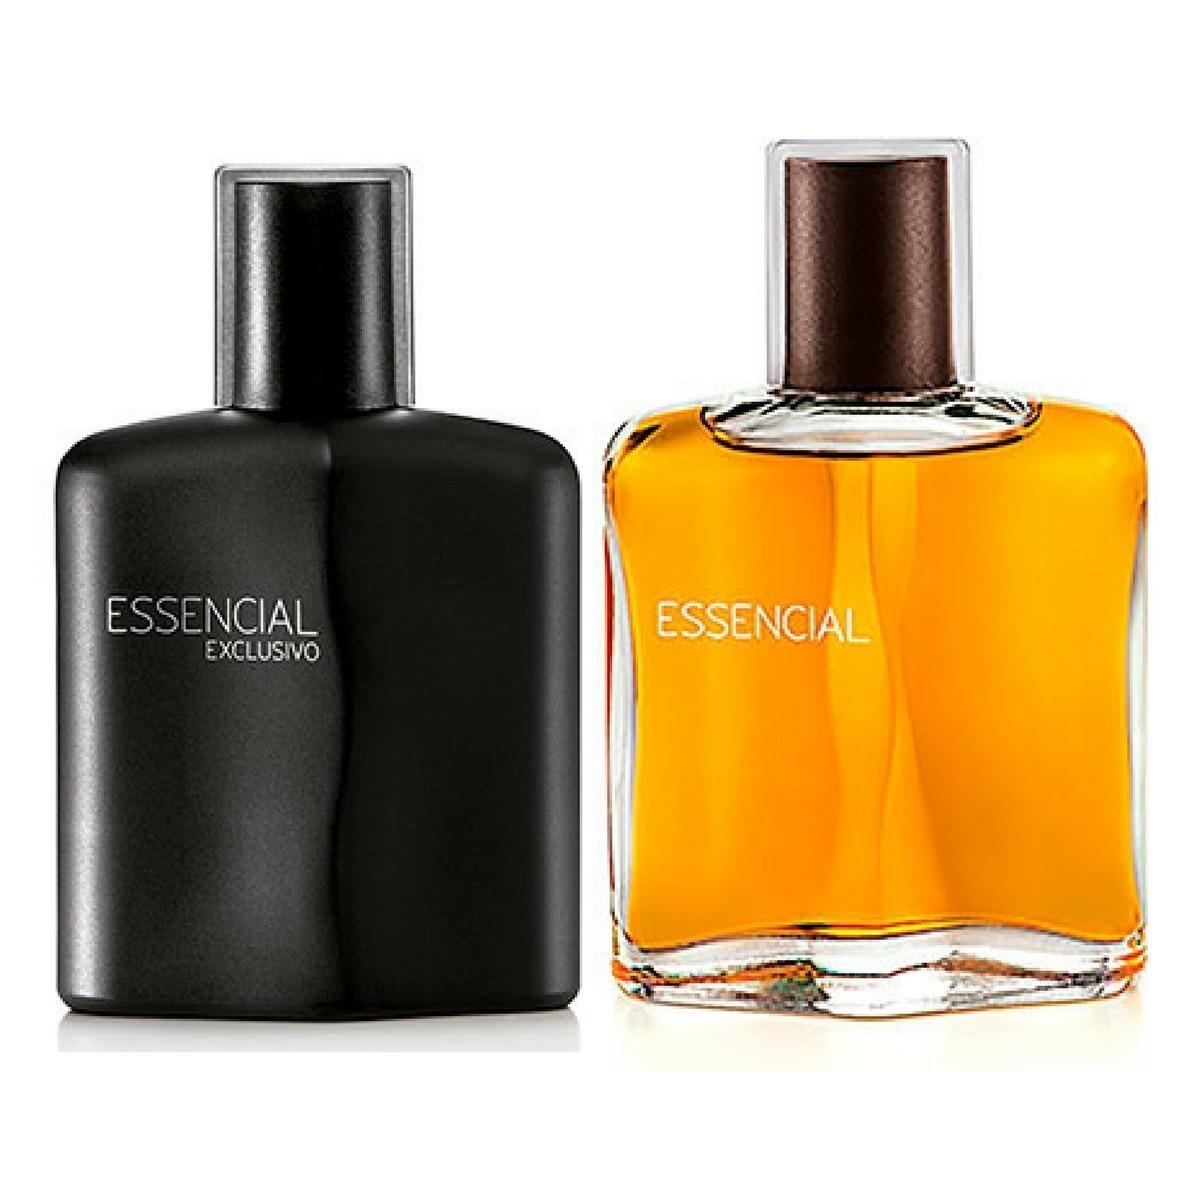 Deo Parfum Essencial Masculino - 100ml + Deo Parfum Essencial Exclusivo Masculino - 100ml